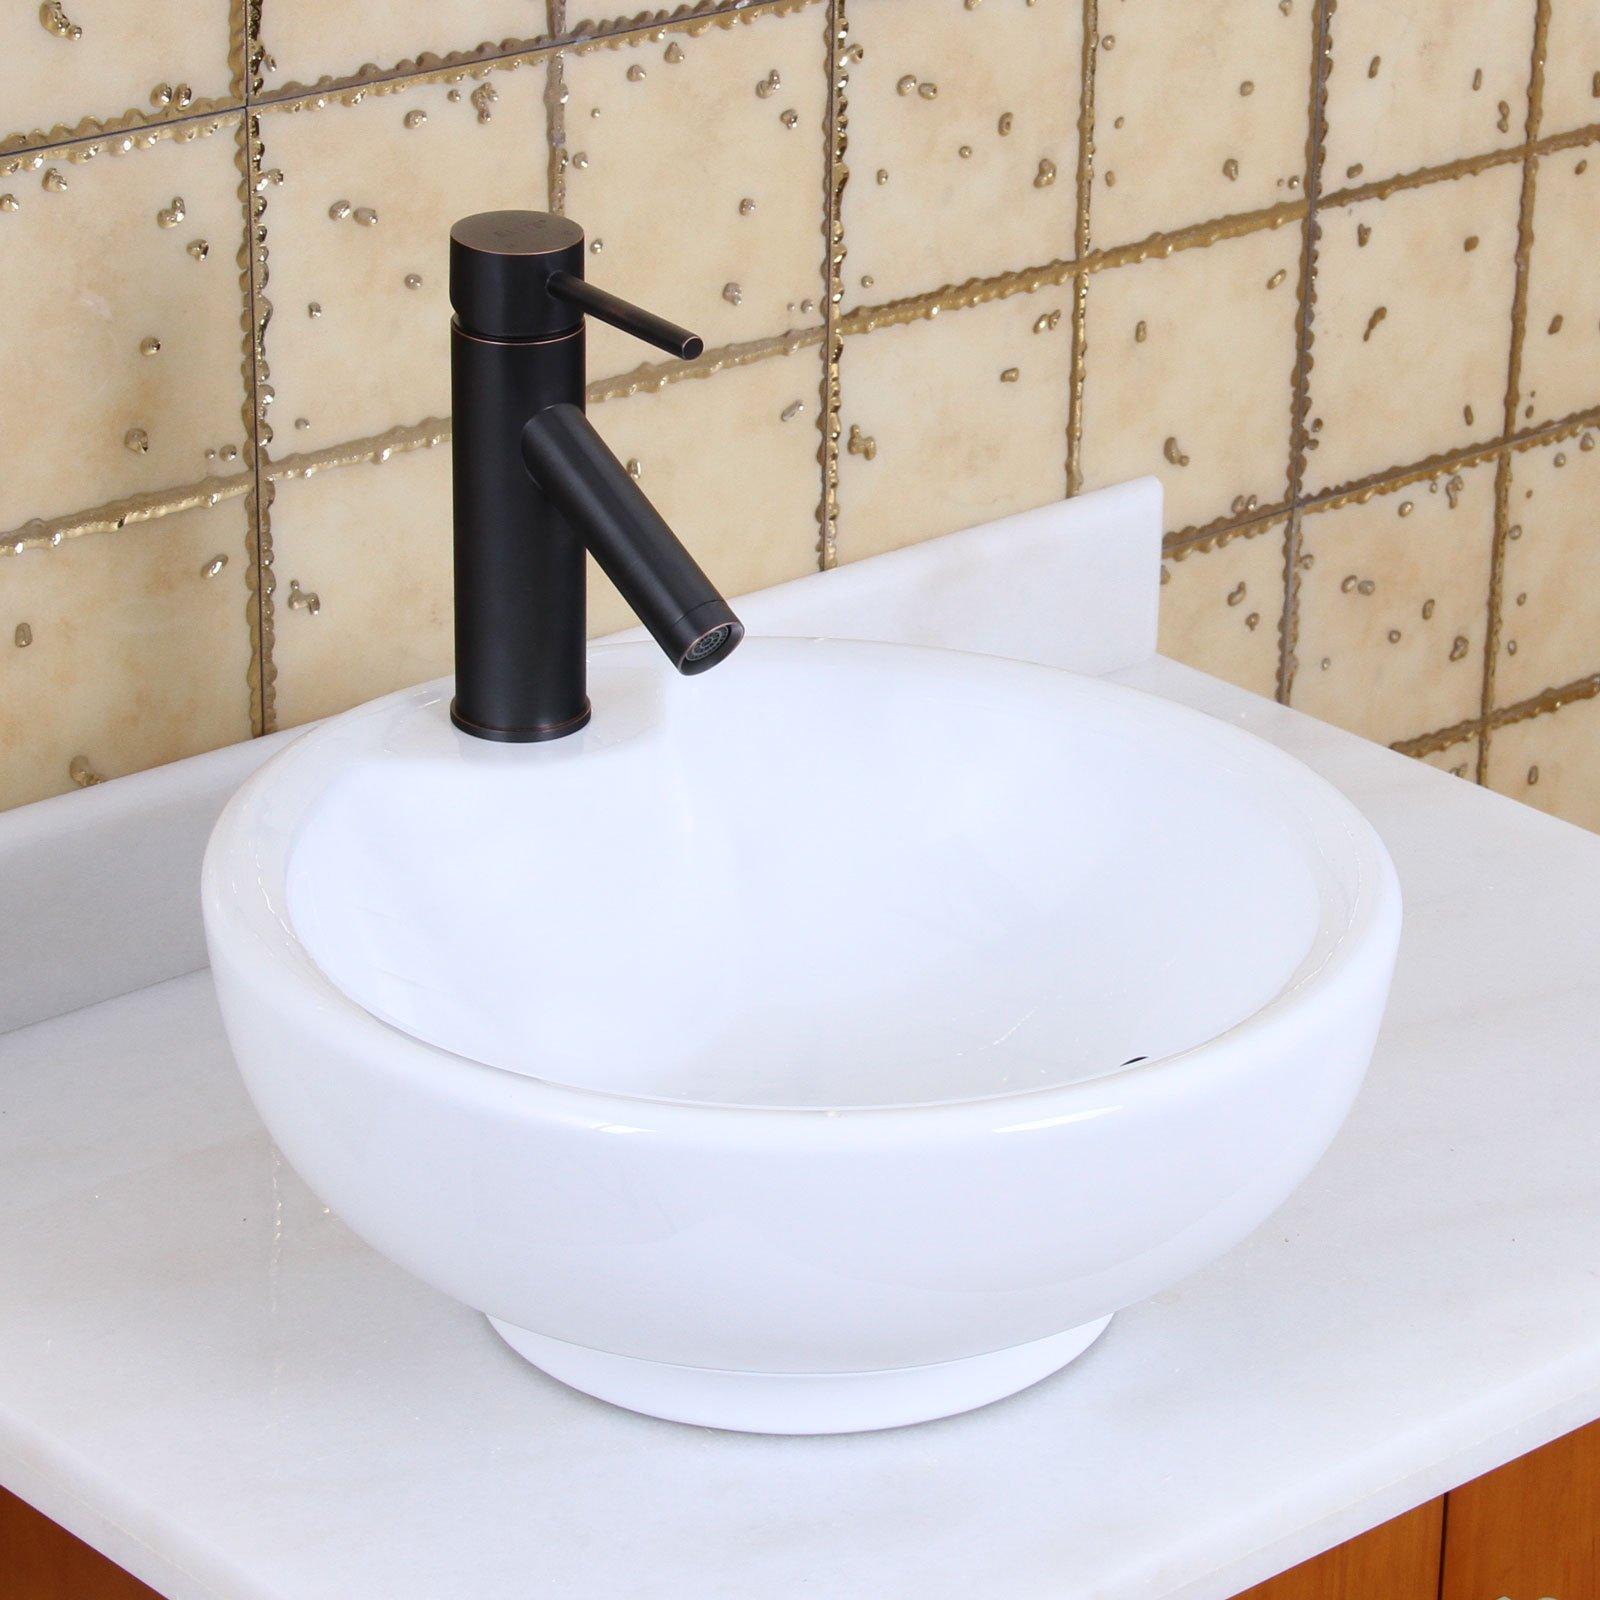 ELITE Bathroom White Bowl Round Ceramic Porcelain Vessel Sink & Short Oil Rubbed Bronze Faucet by ELITE